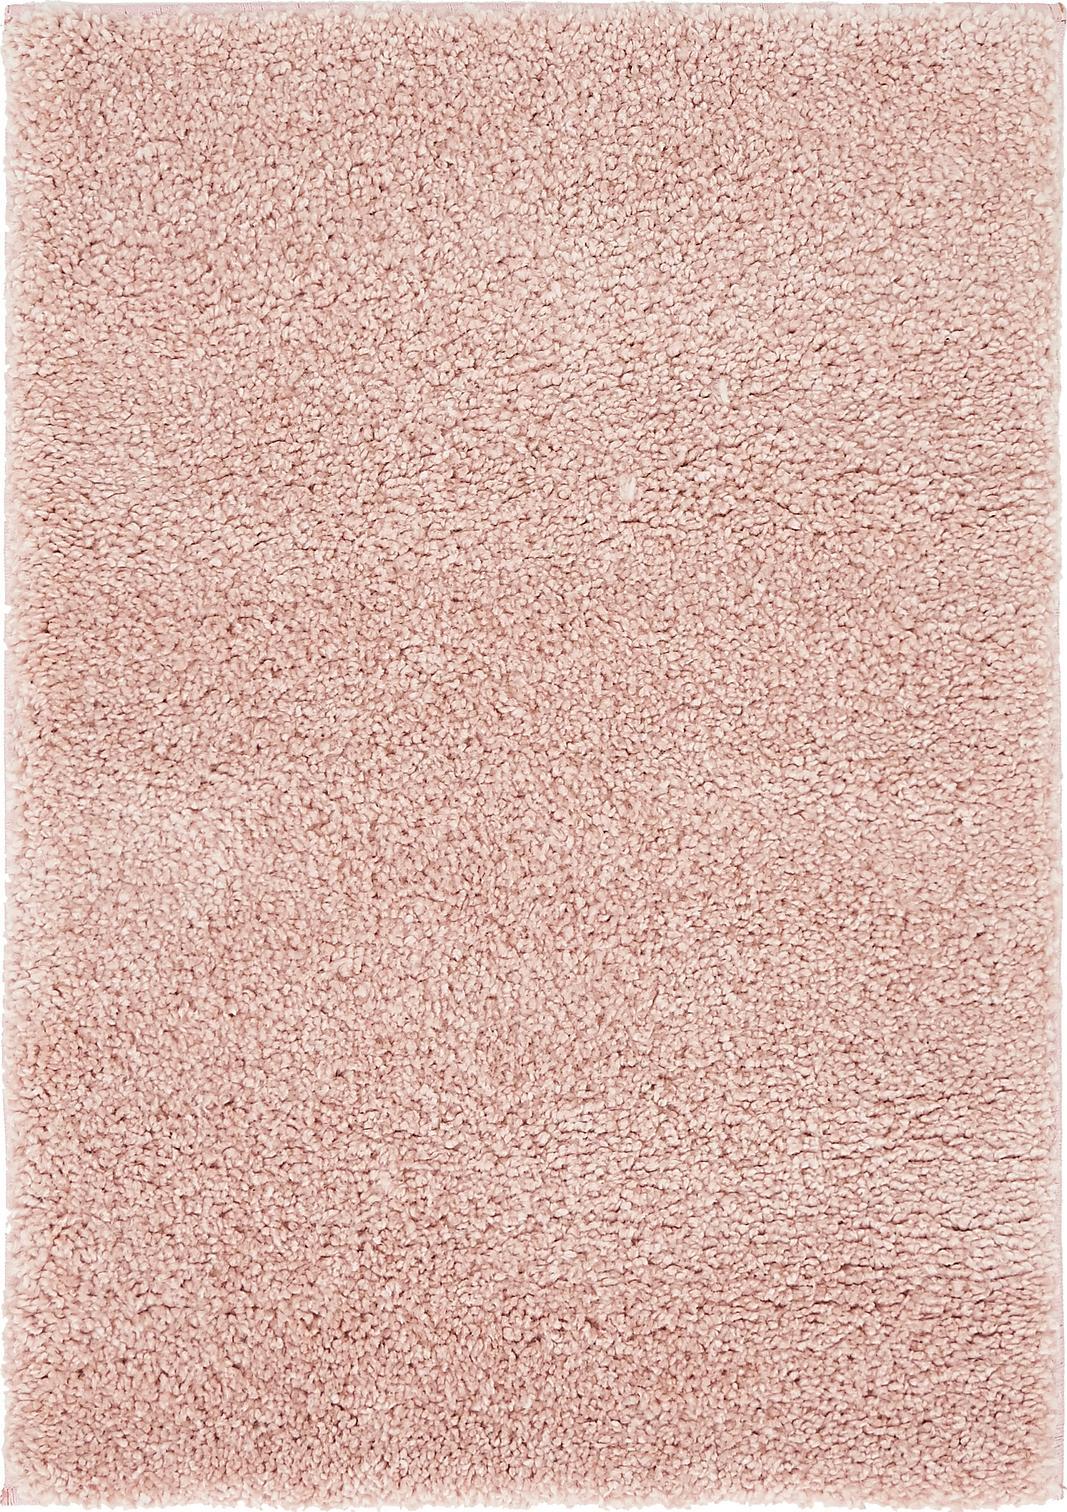 pink 2' 2 x 3' solid frieze rug | area rugs | esalerugs